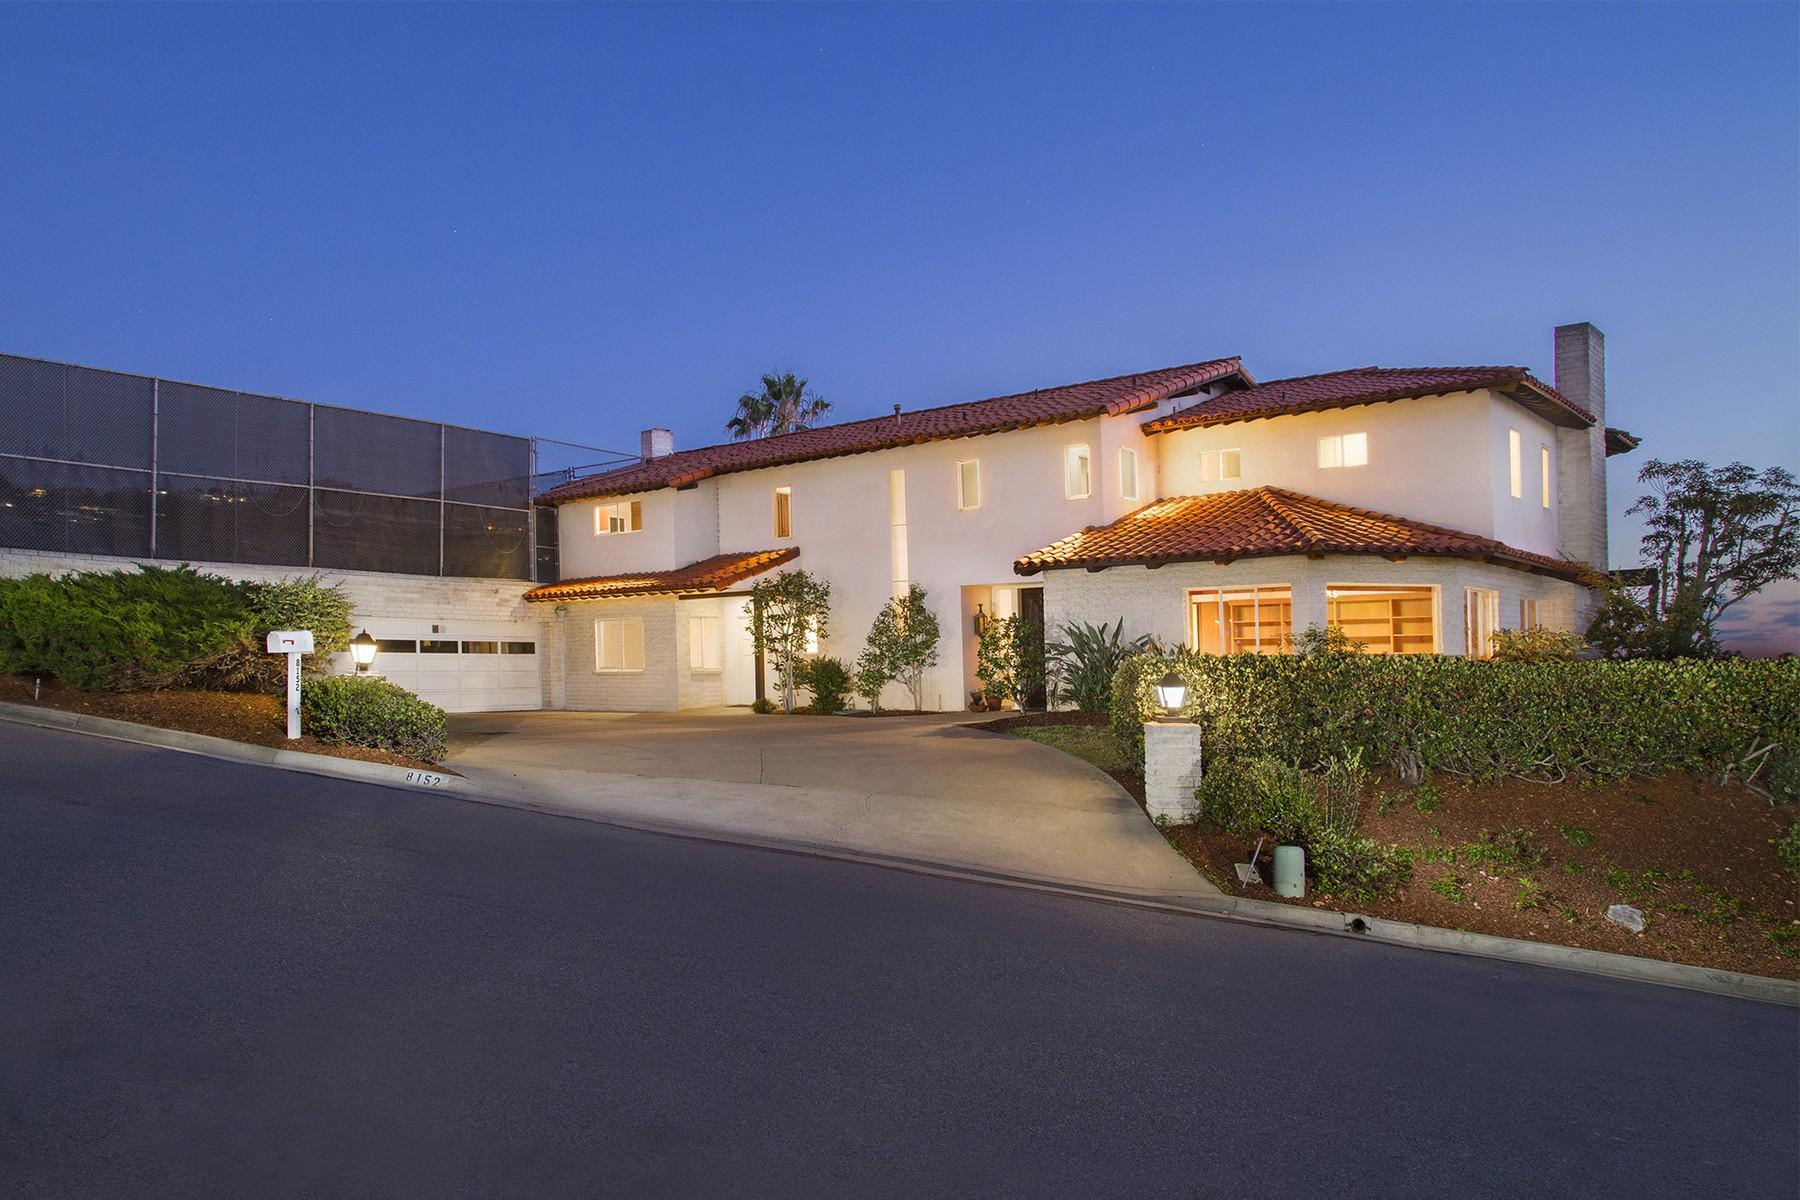 Property For Sale at La Jolla Shores Ocean View Estate